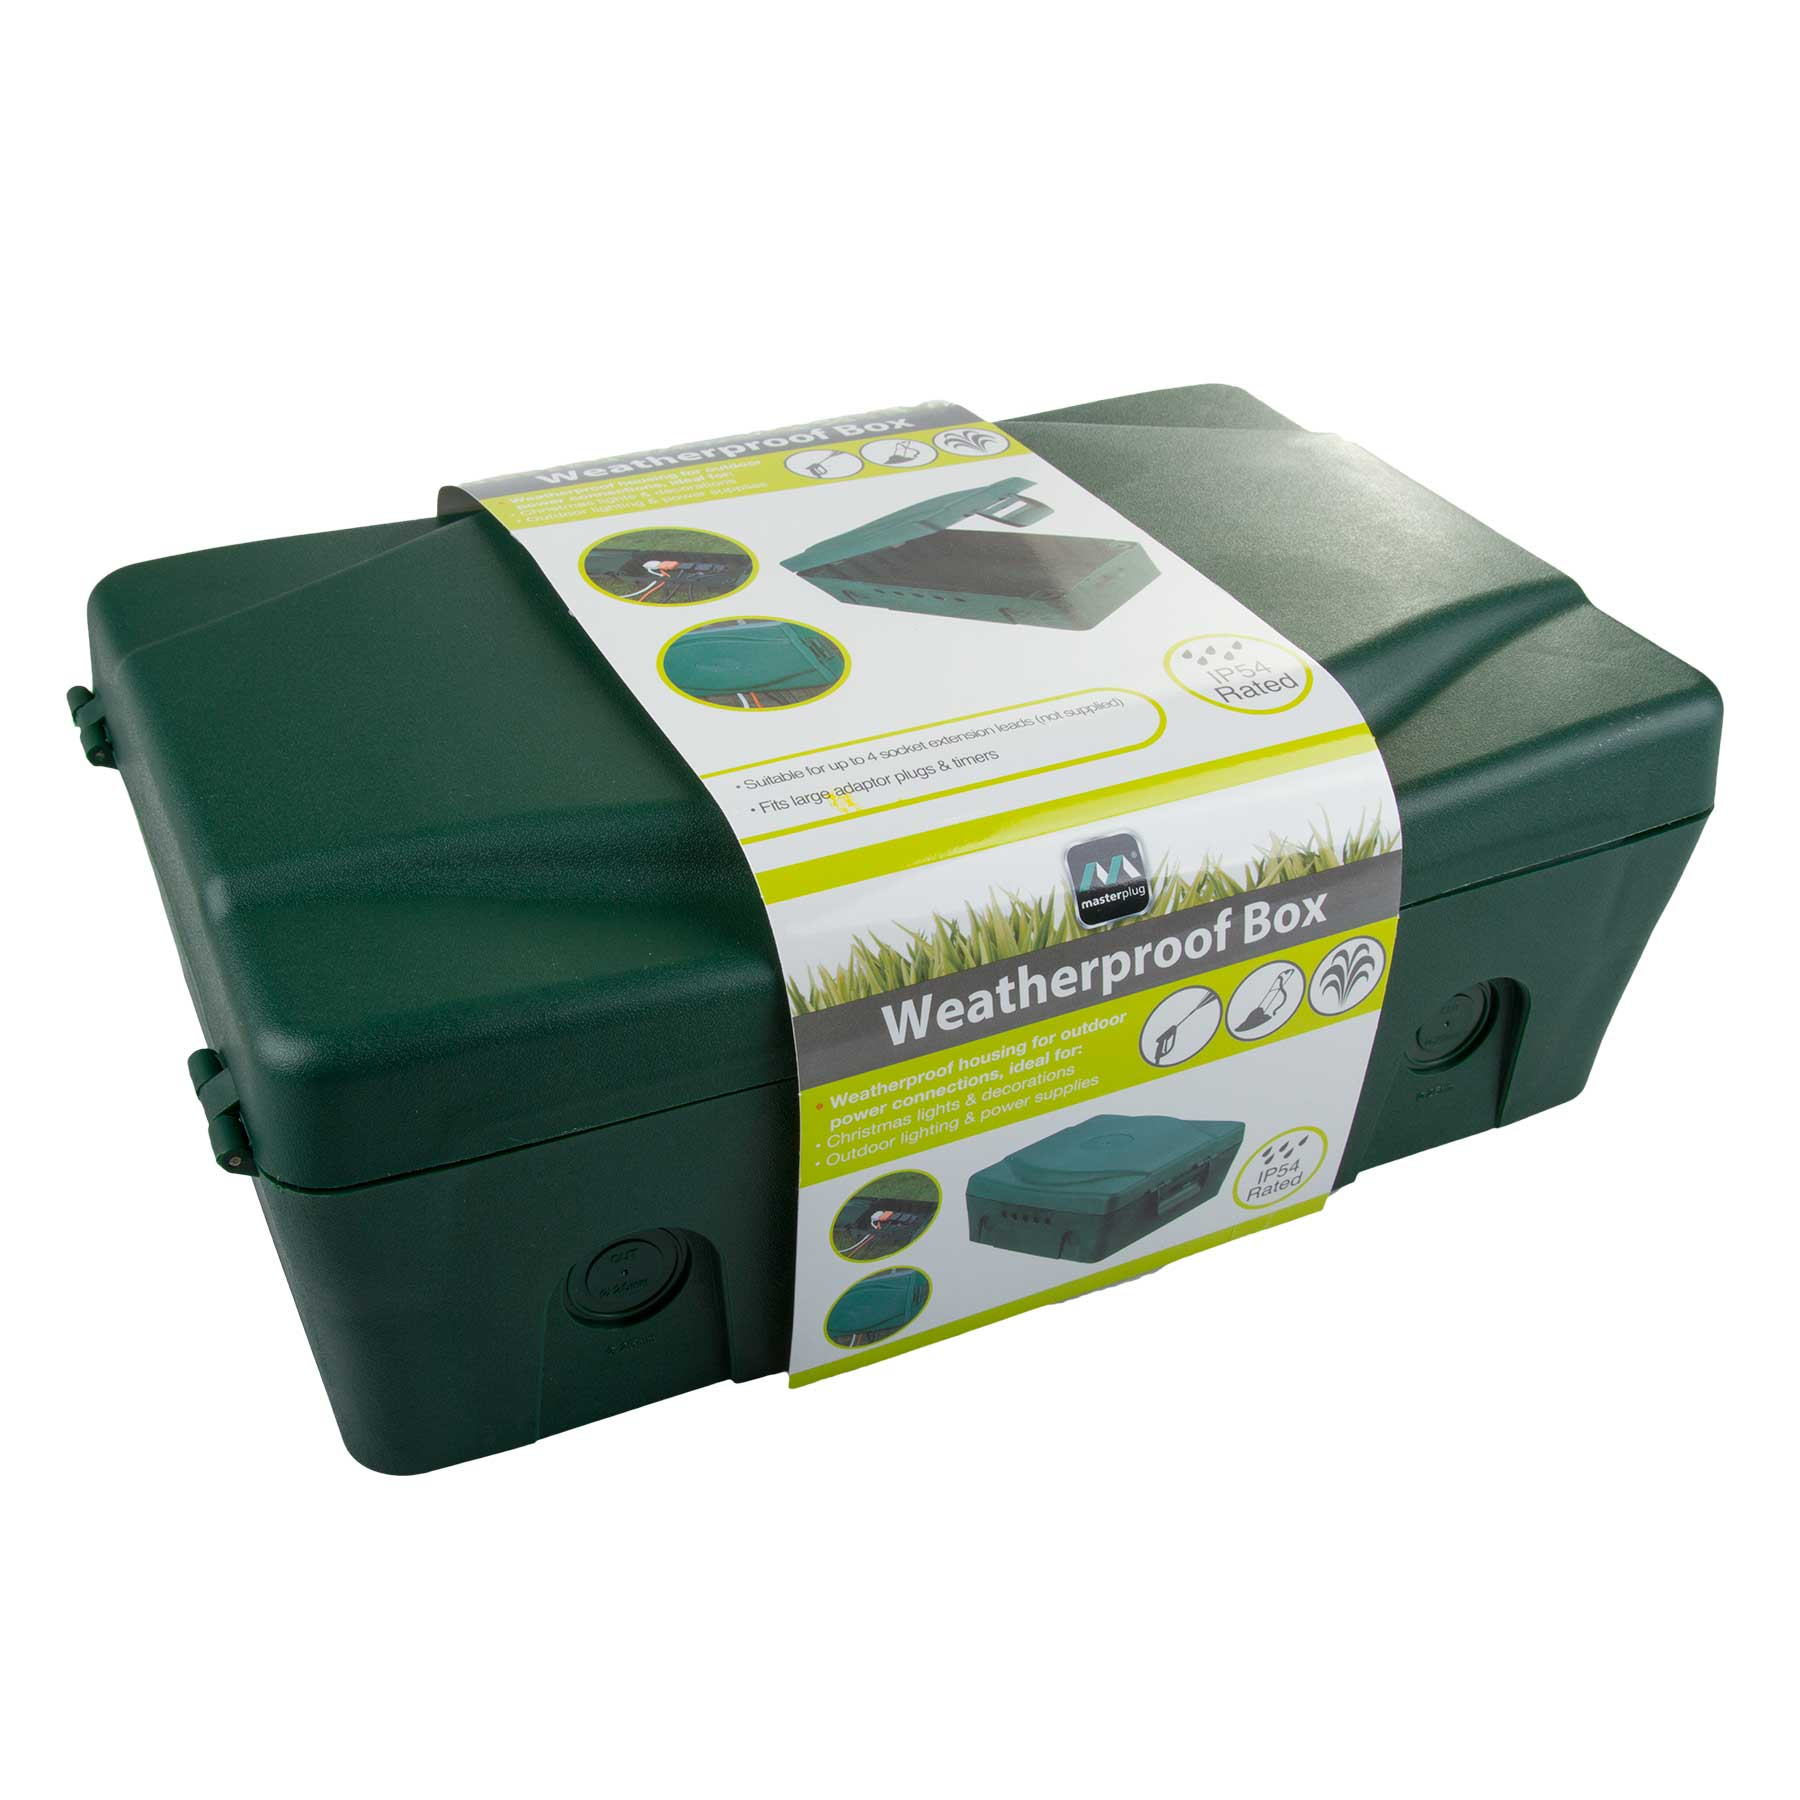 Masterplug Green Weatherproof Box For Outdoor Electrical